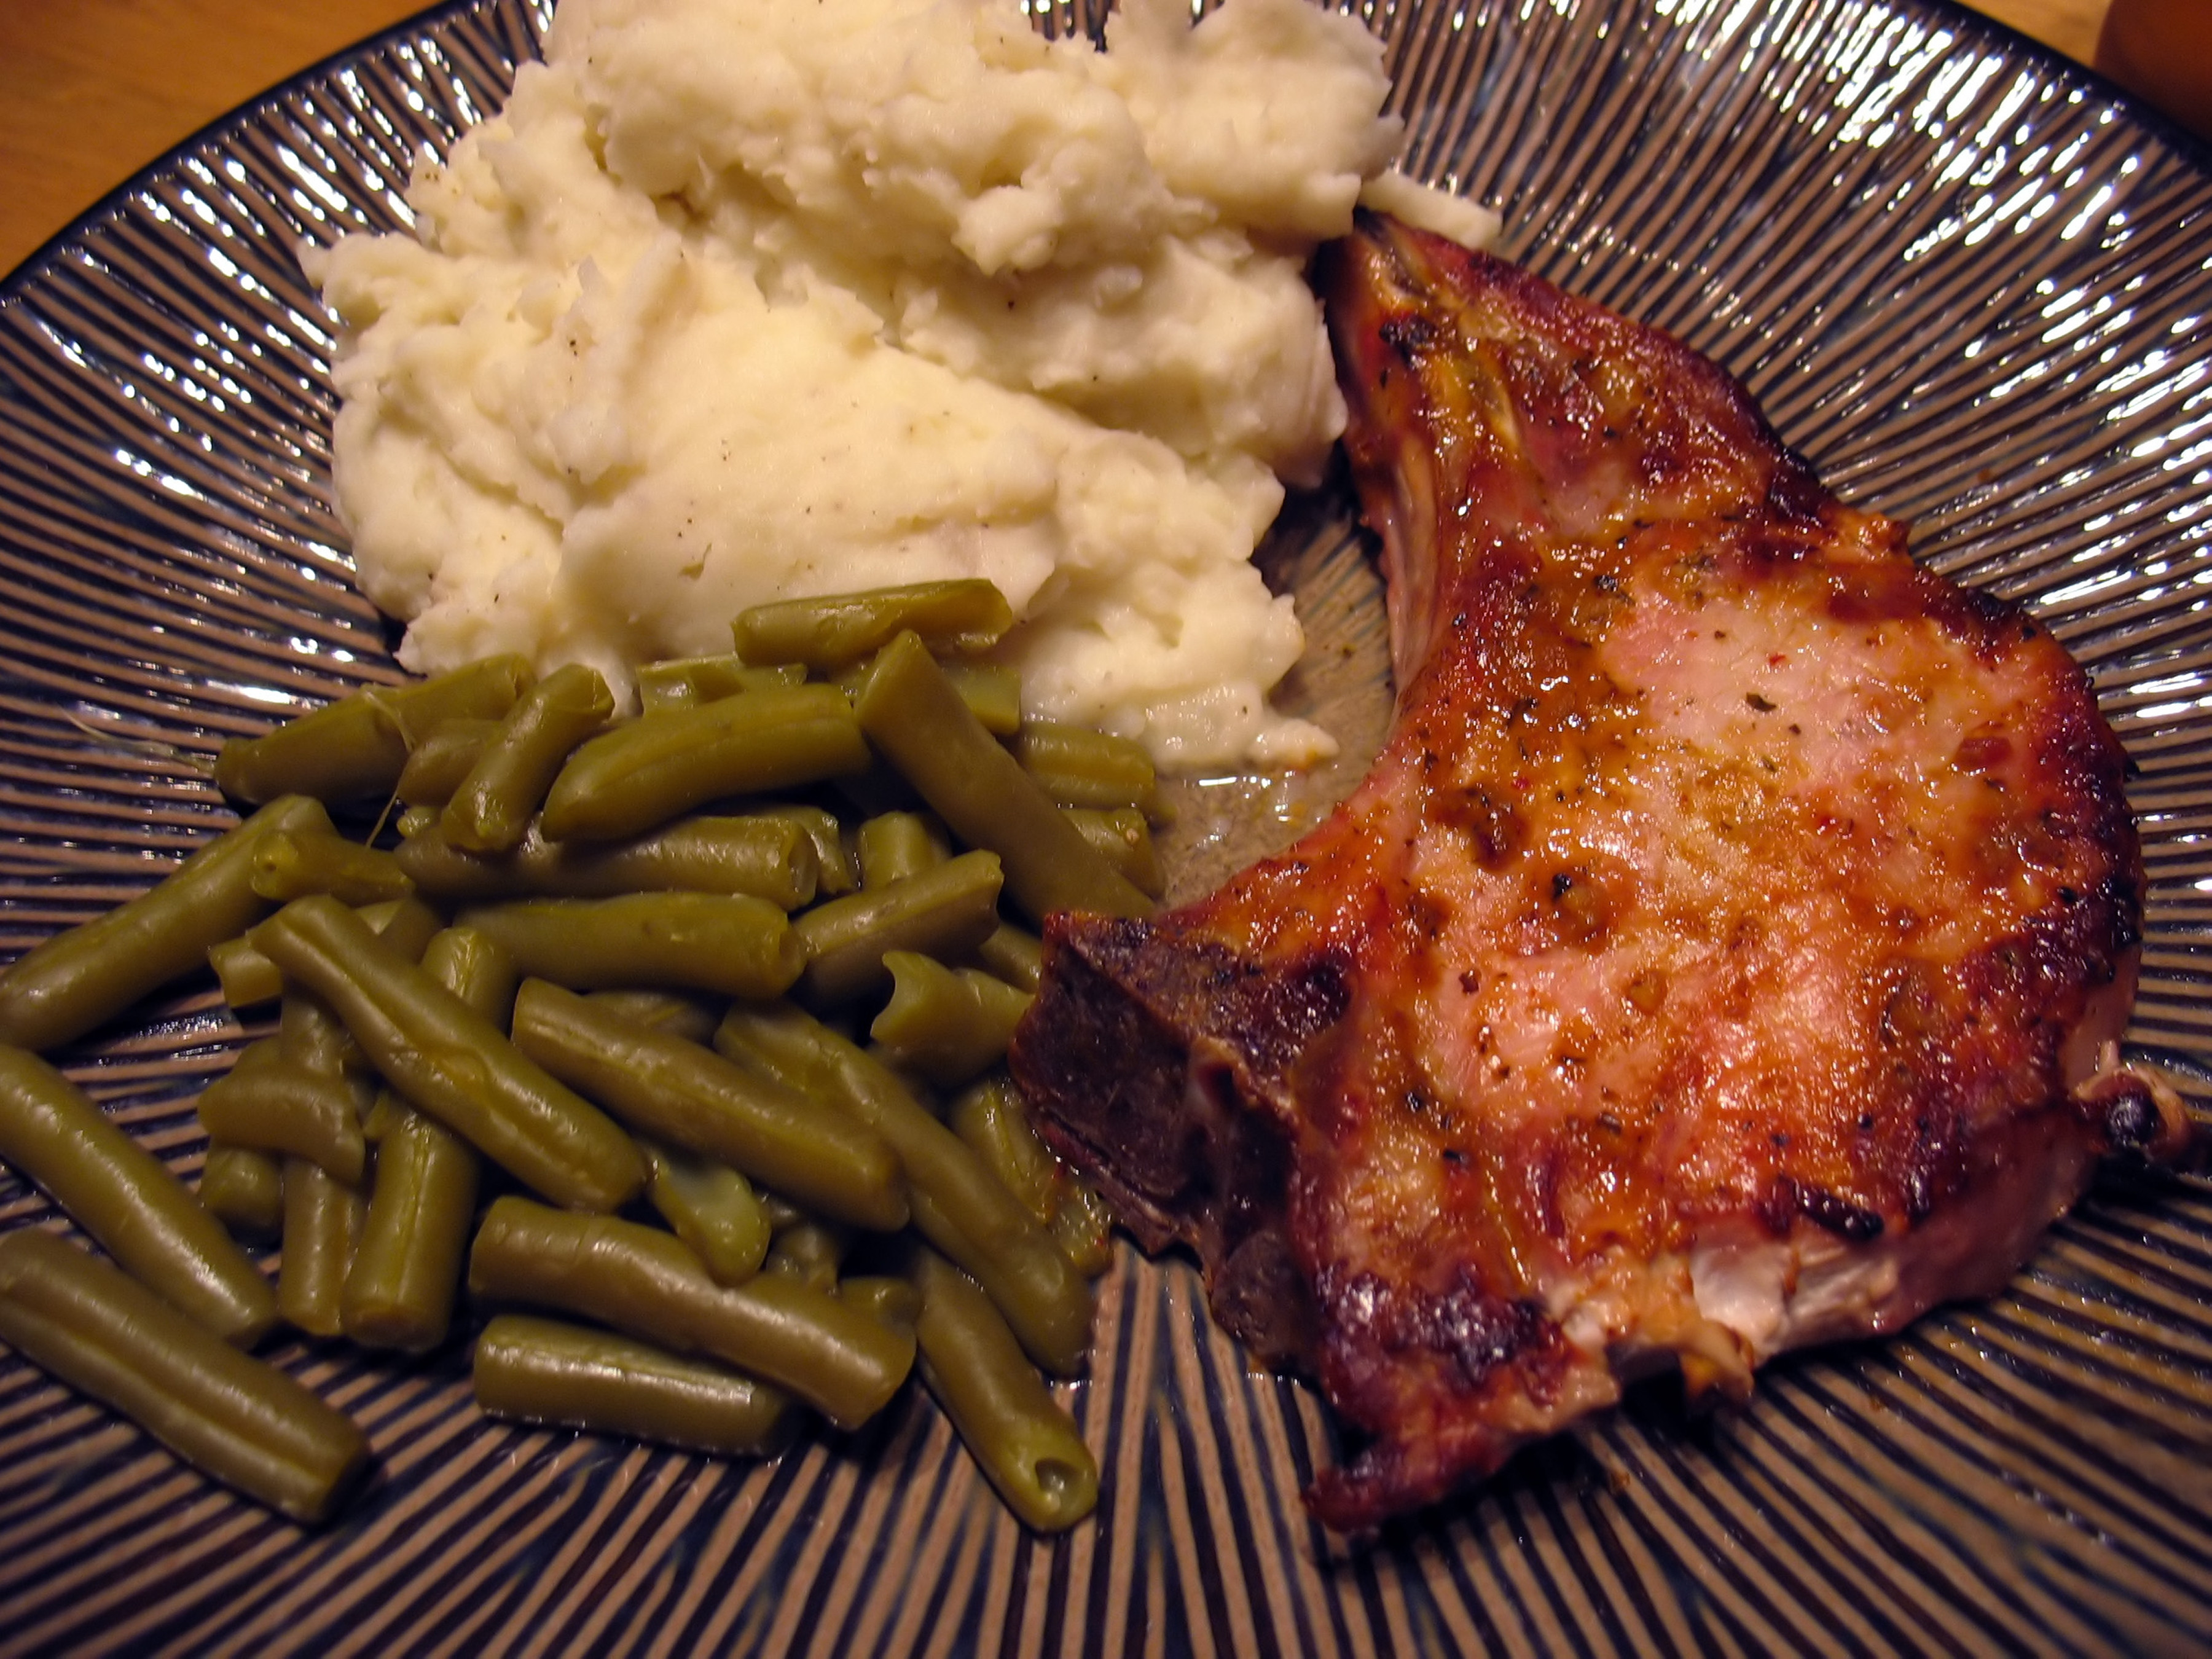 Pork Chop Dinner  Stealth Health 17 Recipes That Make Cooking Light Easy